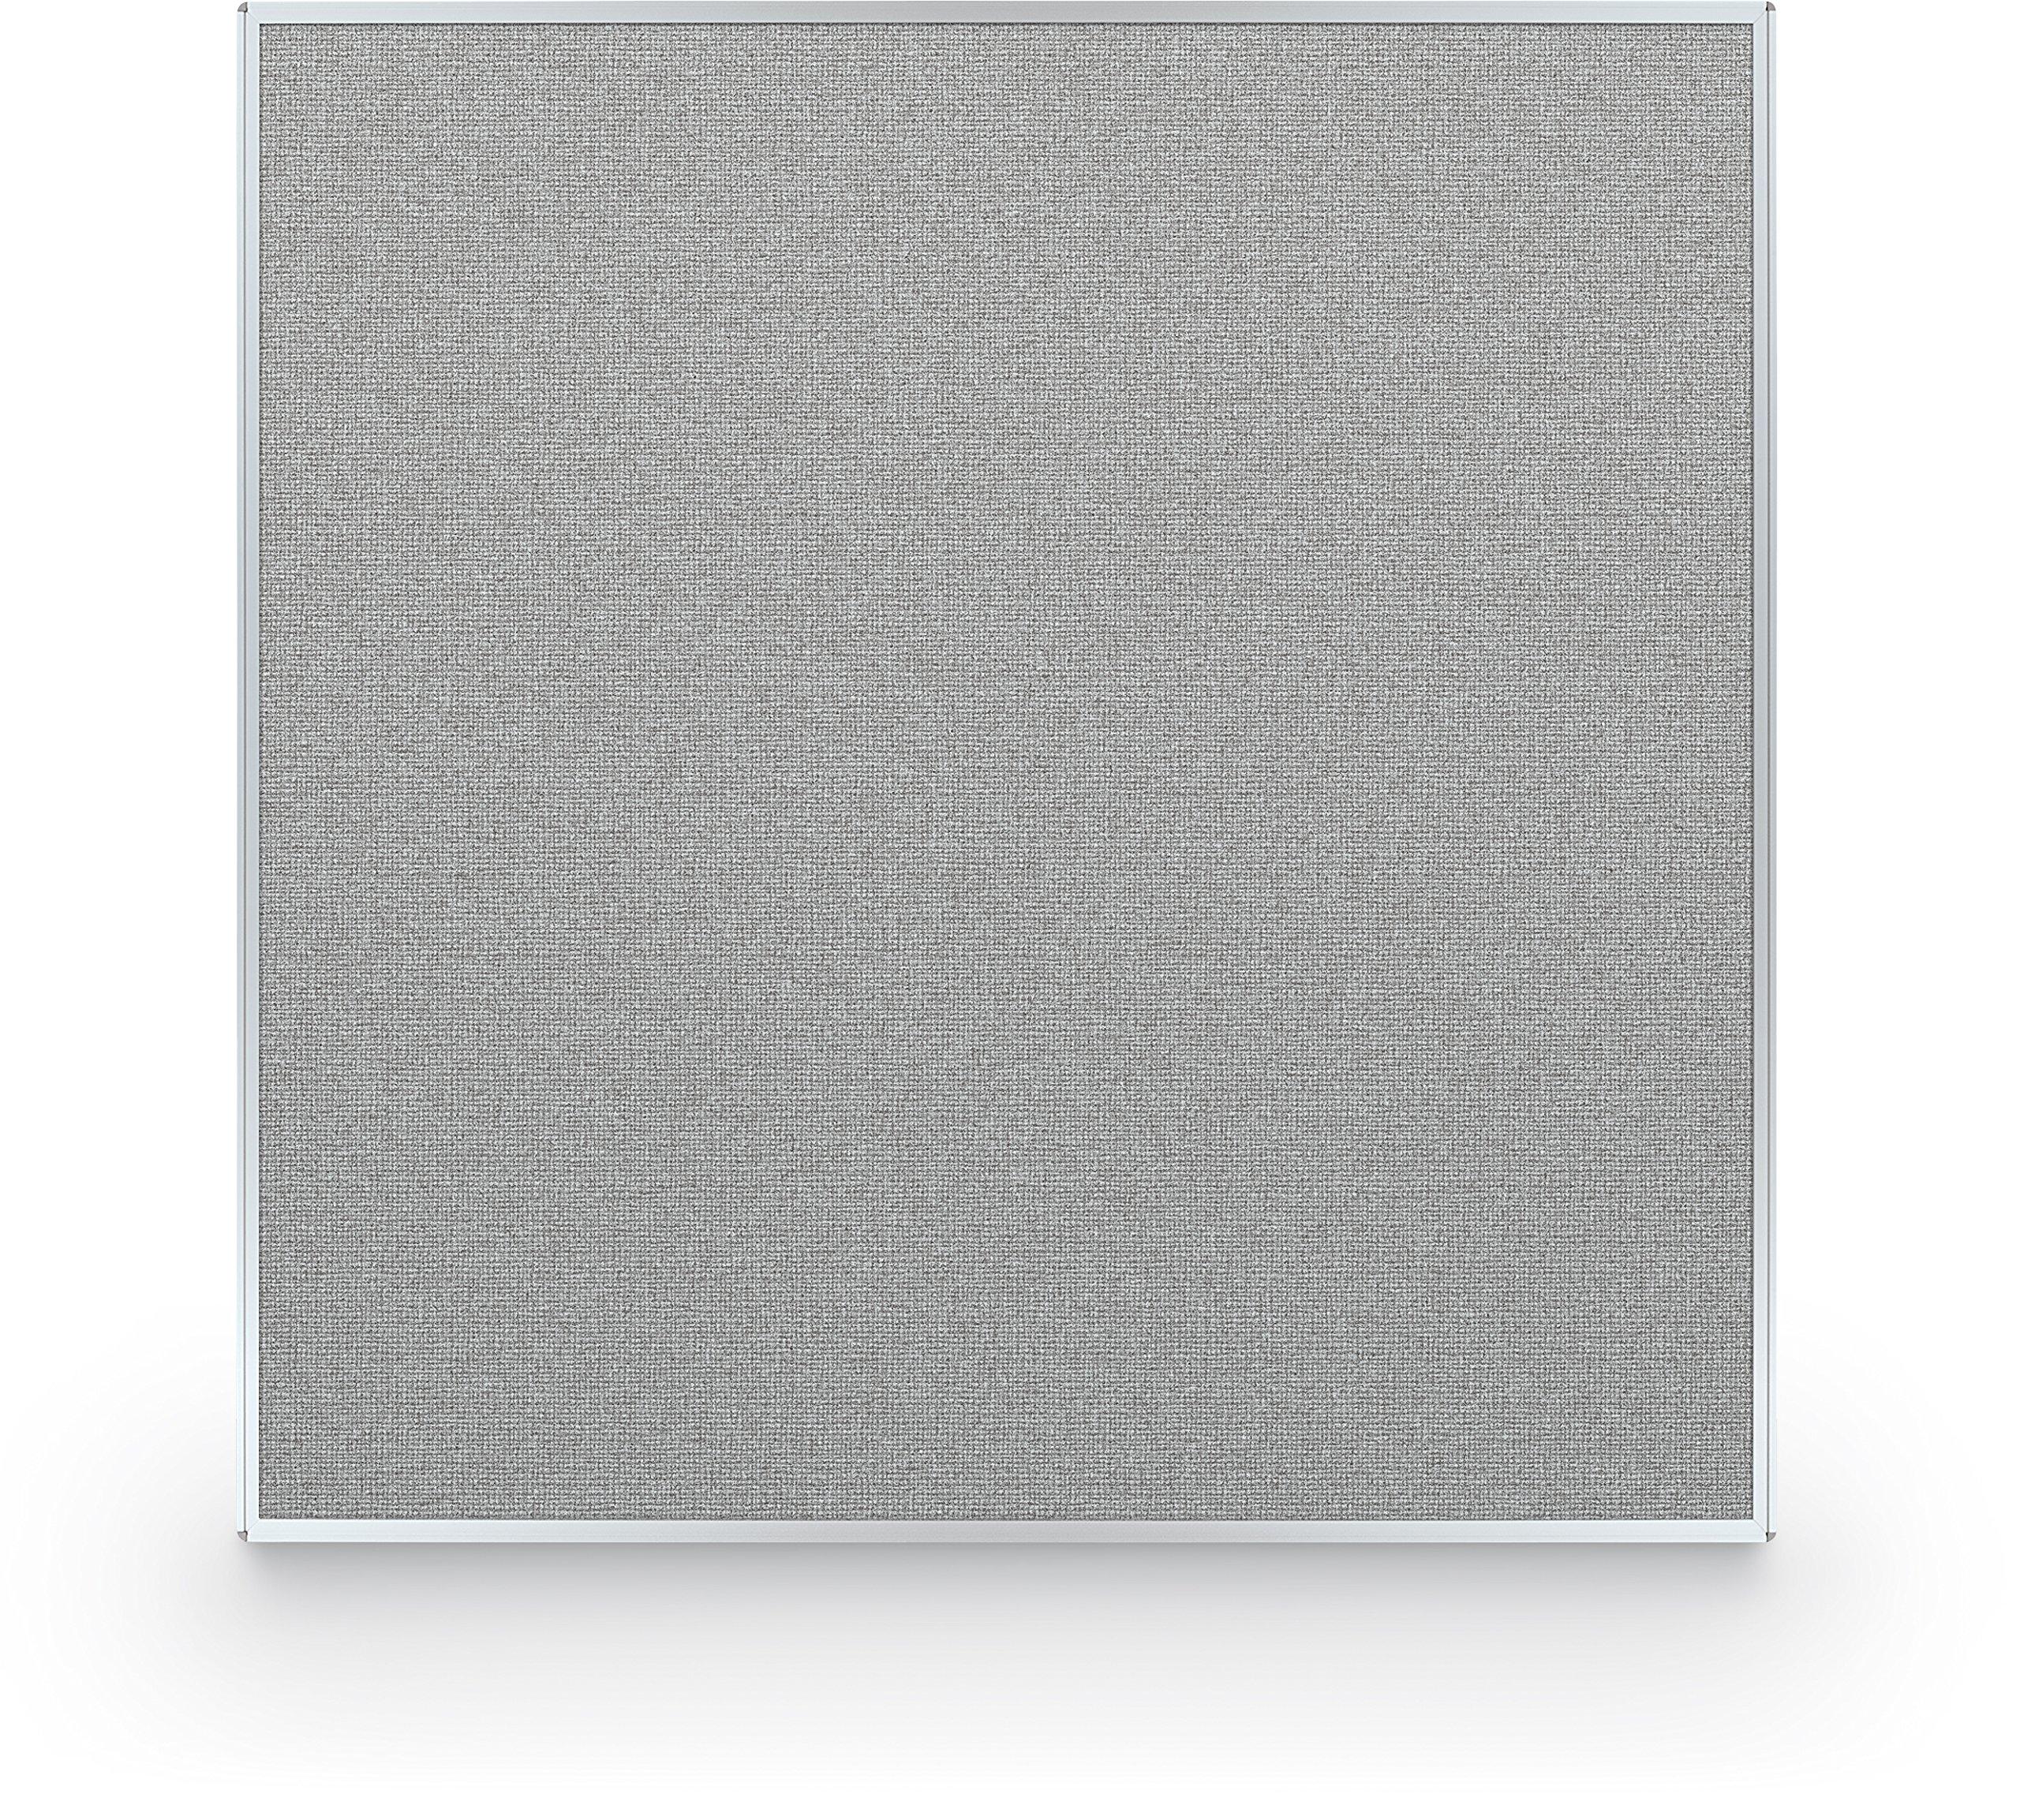 Best-Rite 60 x 60 Inch Standard Modular Divider Panel, Gray Fabric Panel, (66217-88)